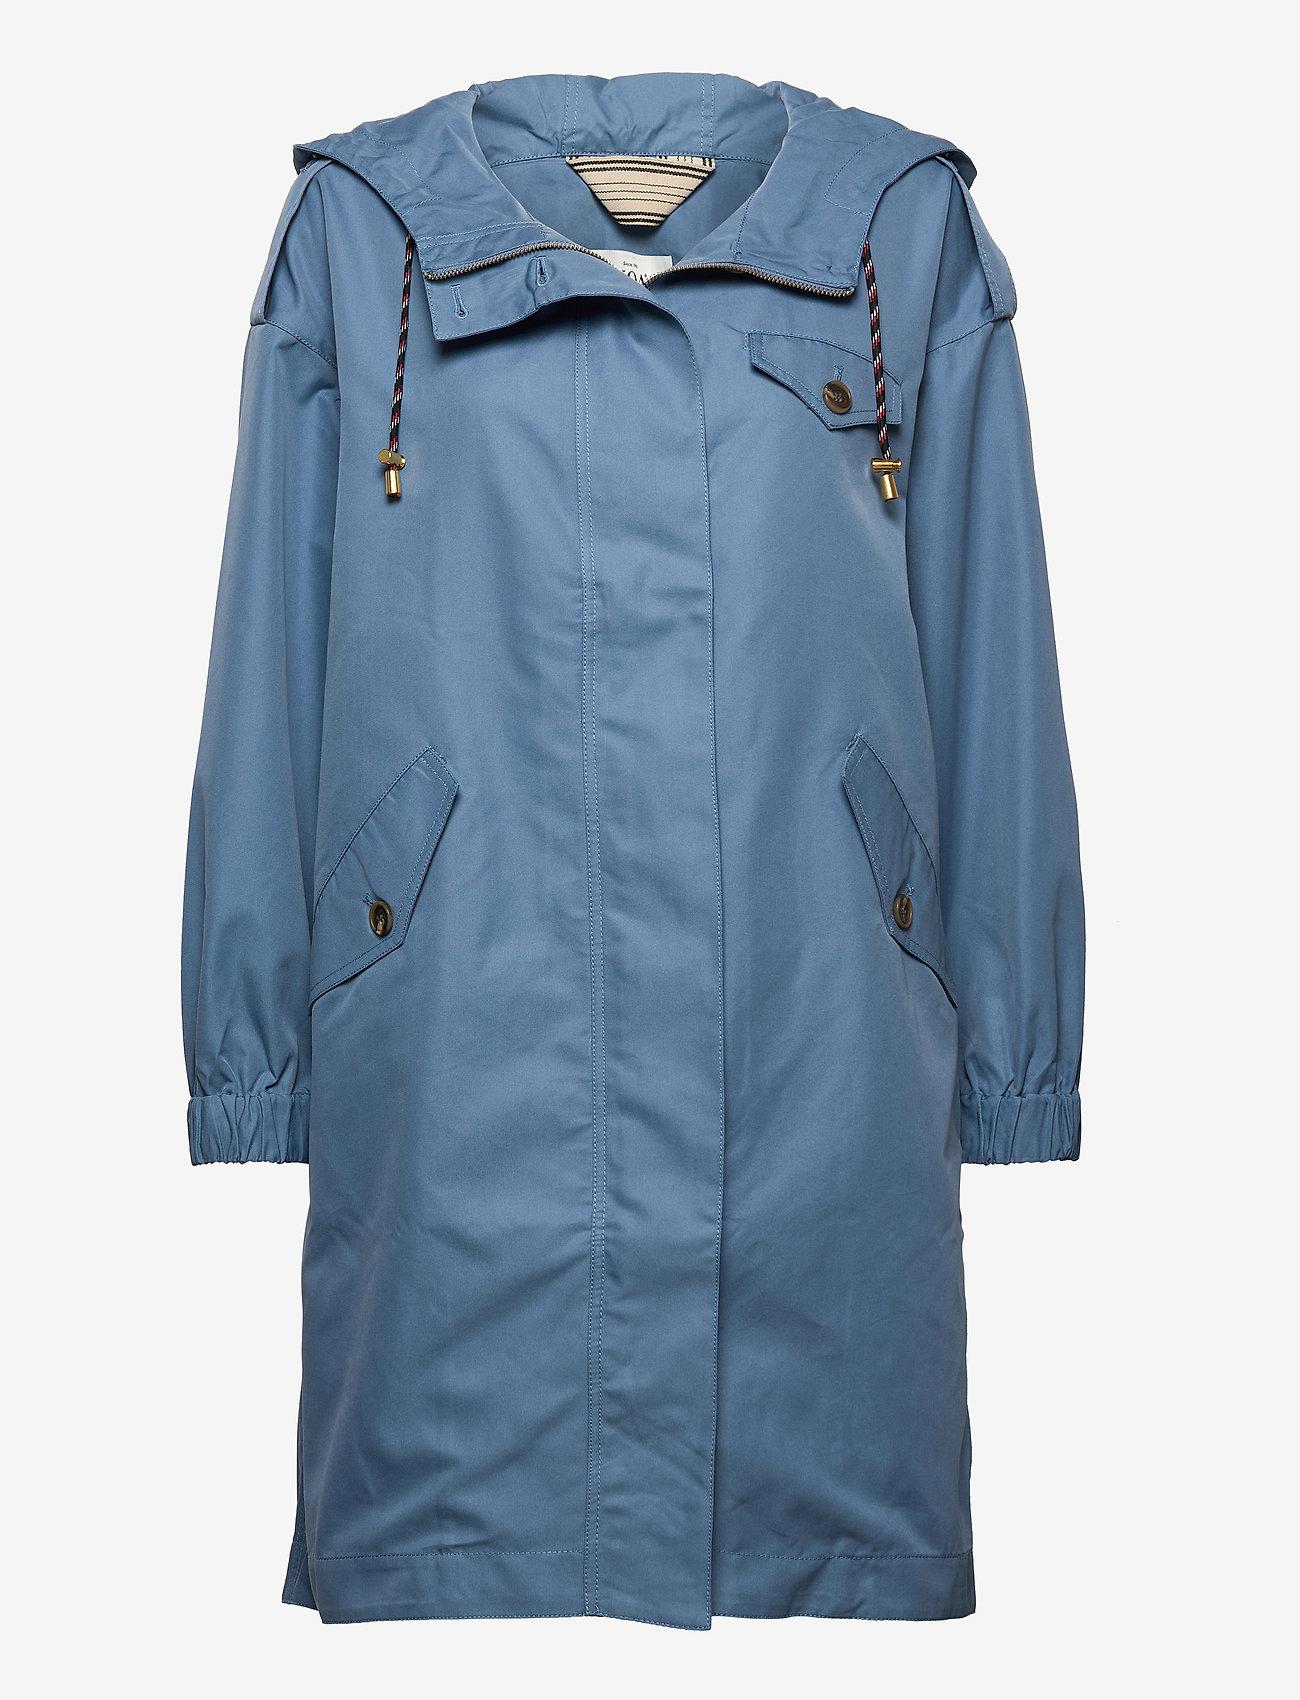 Noa Noa - Light outerwear - parkas - quiet harbor - 0